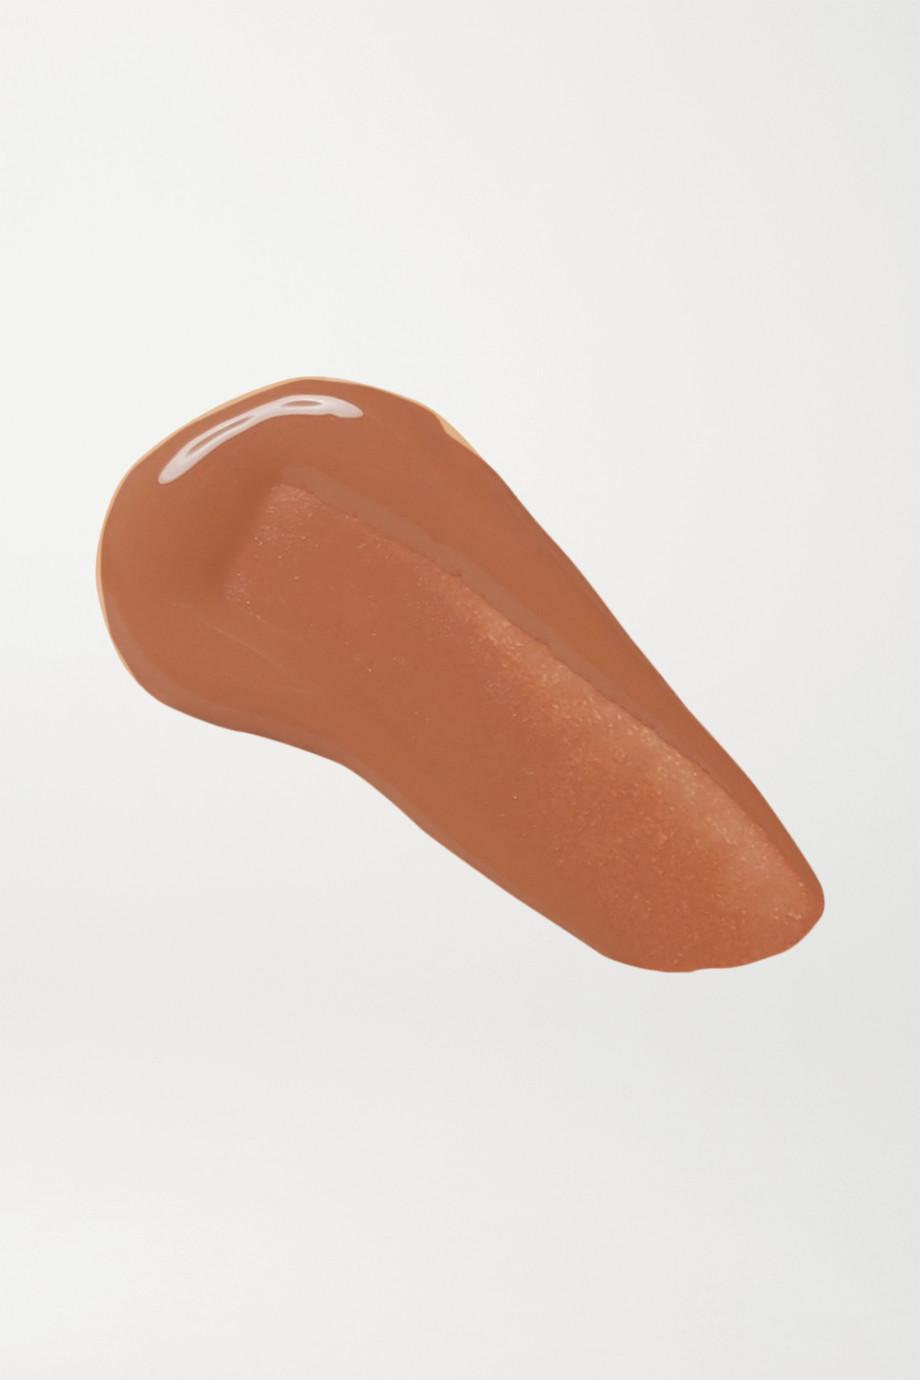 TOM FORD BEAUTY Shade and Illuminate Soft Radiance Foundation SPF50 - 9.5 Warm Almond, 30ml